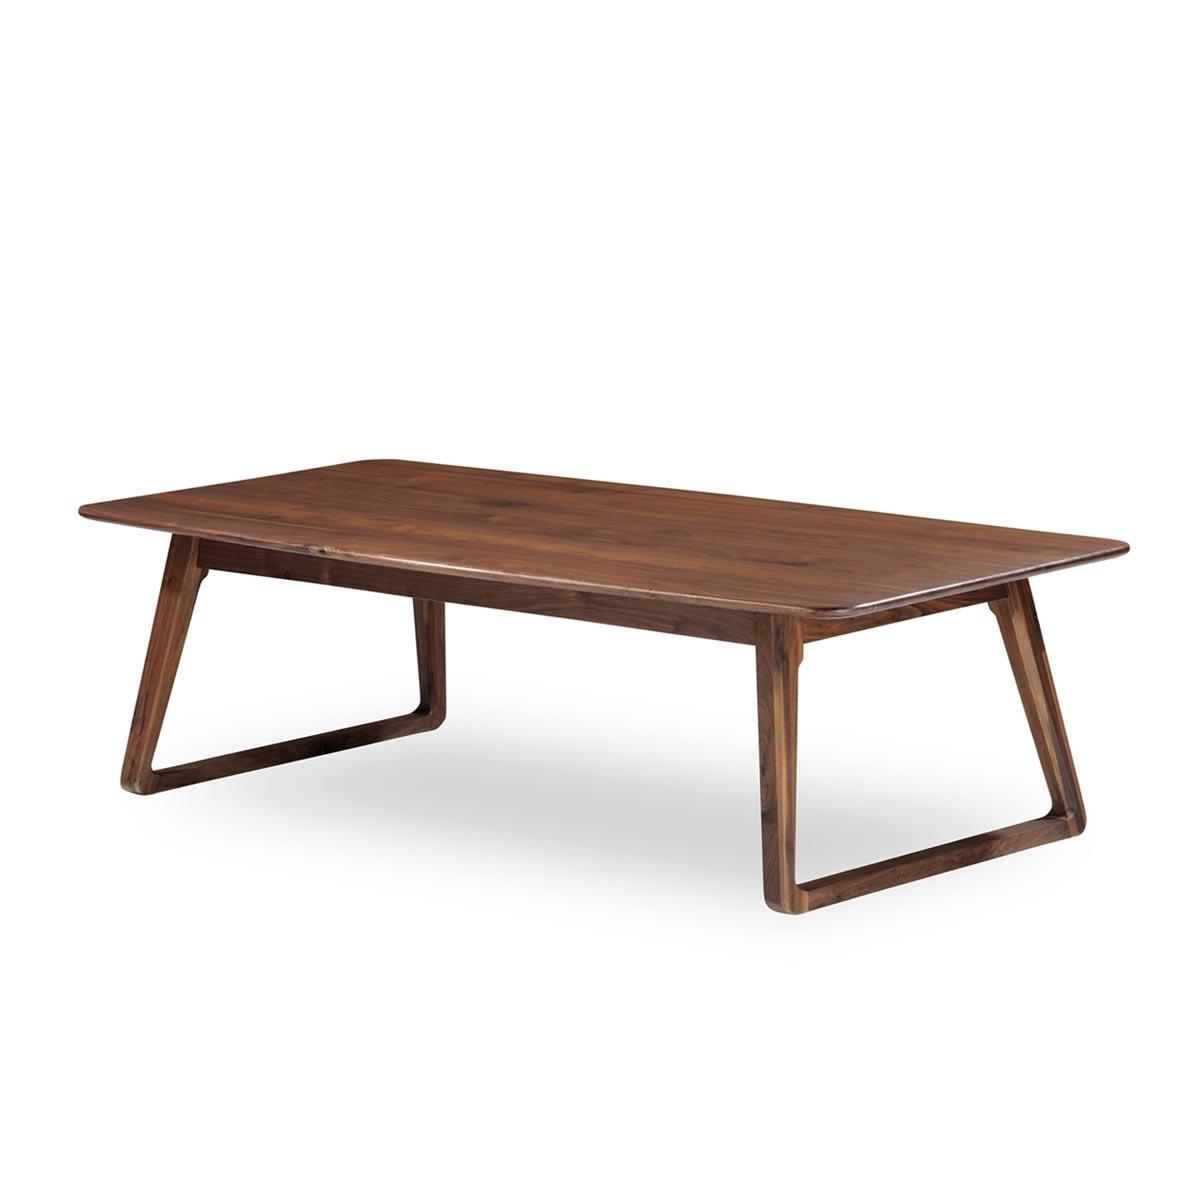 SquareRooms-Commune-Wilbur-Coffee-Table